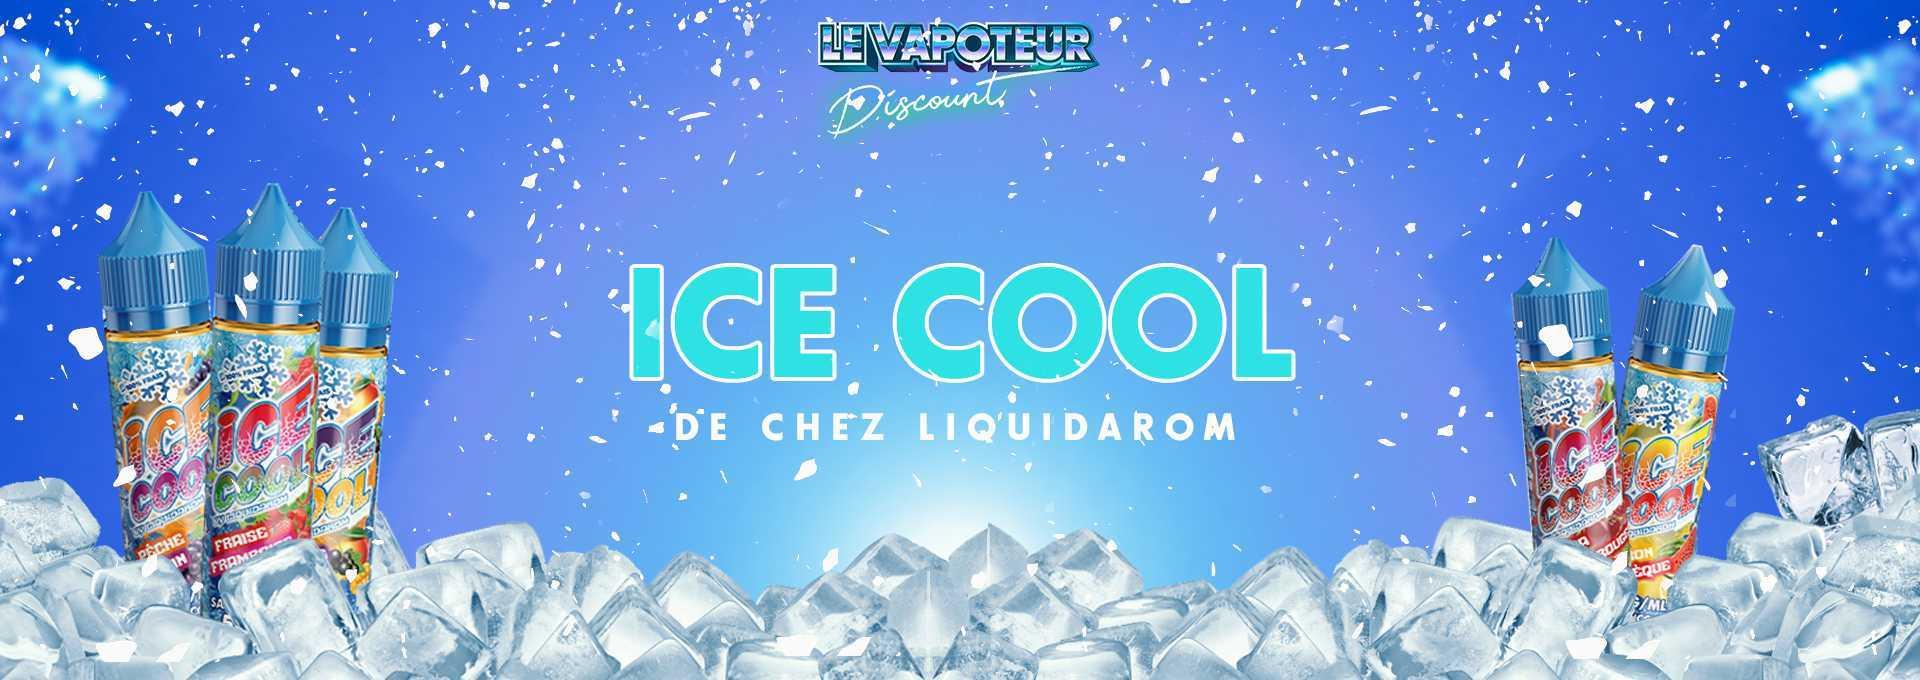 Ice Cool Liquidarom